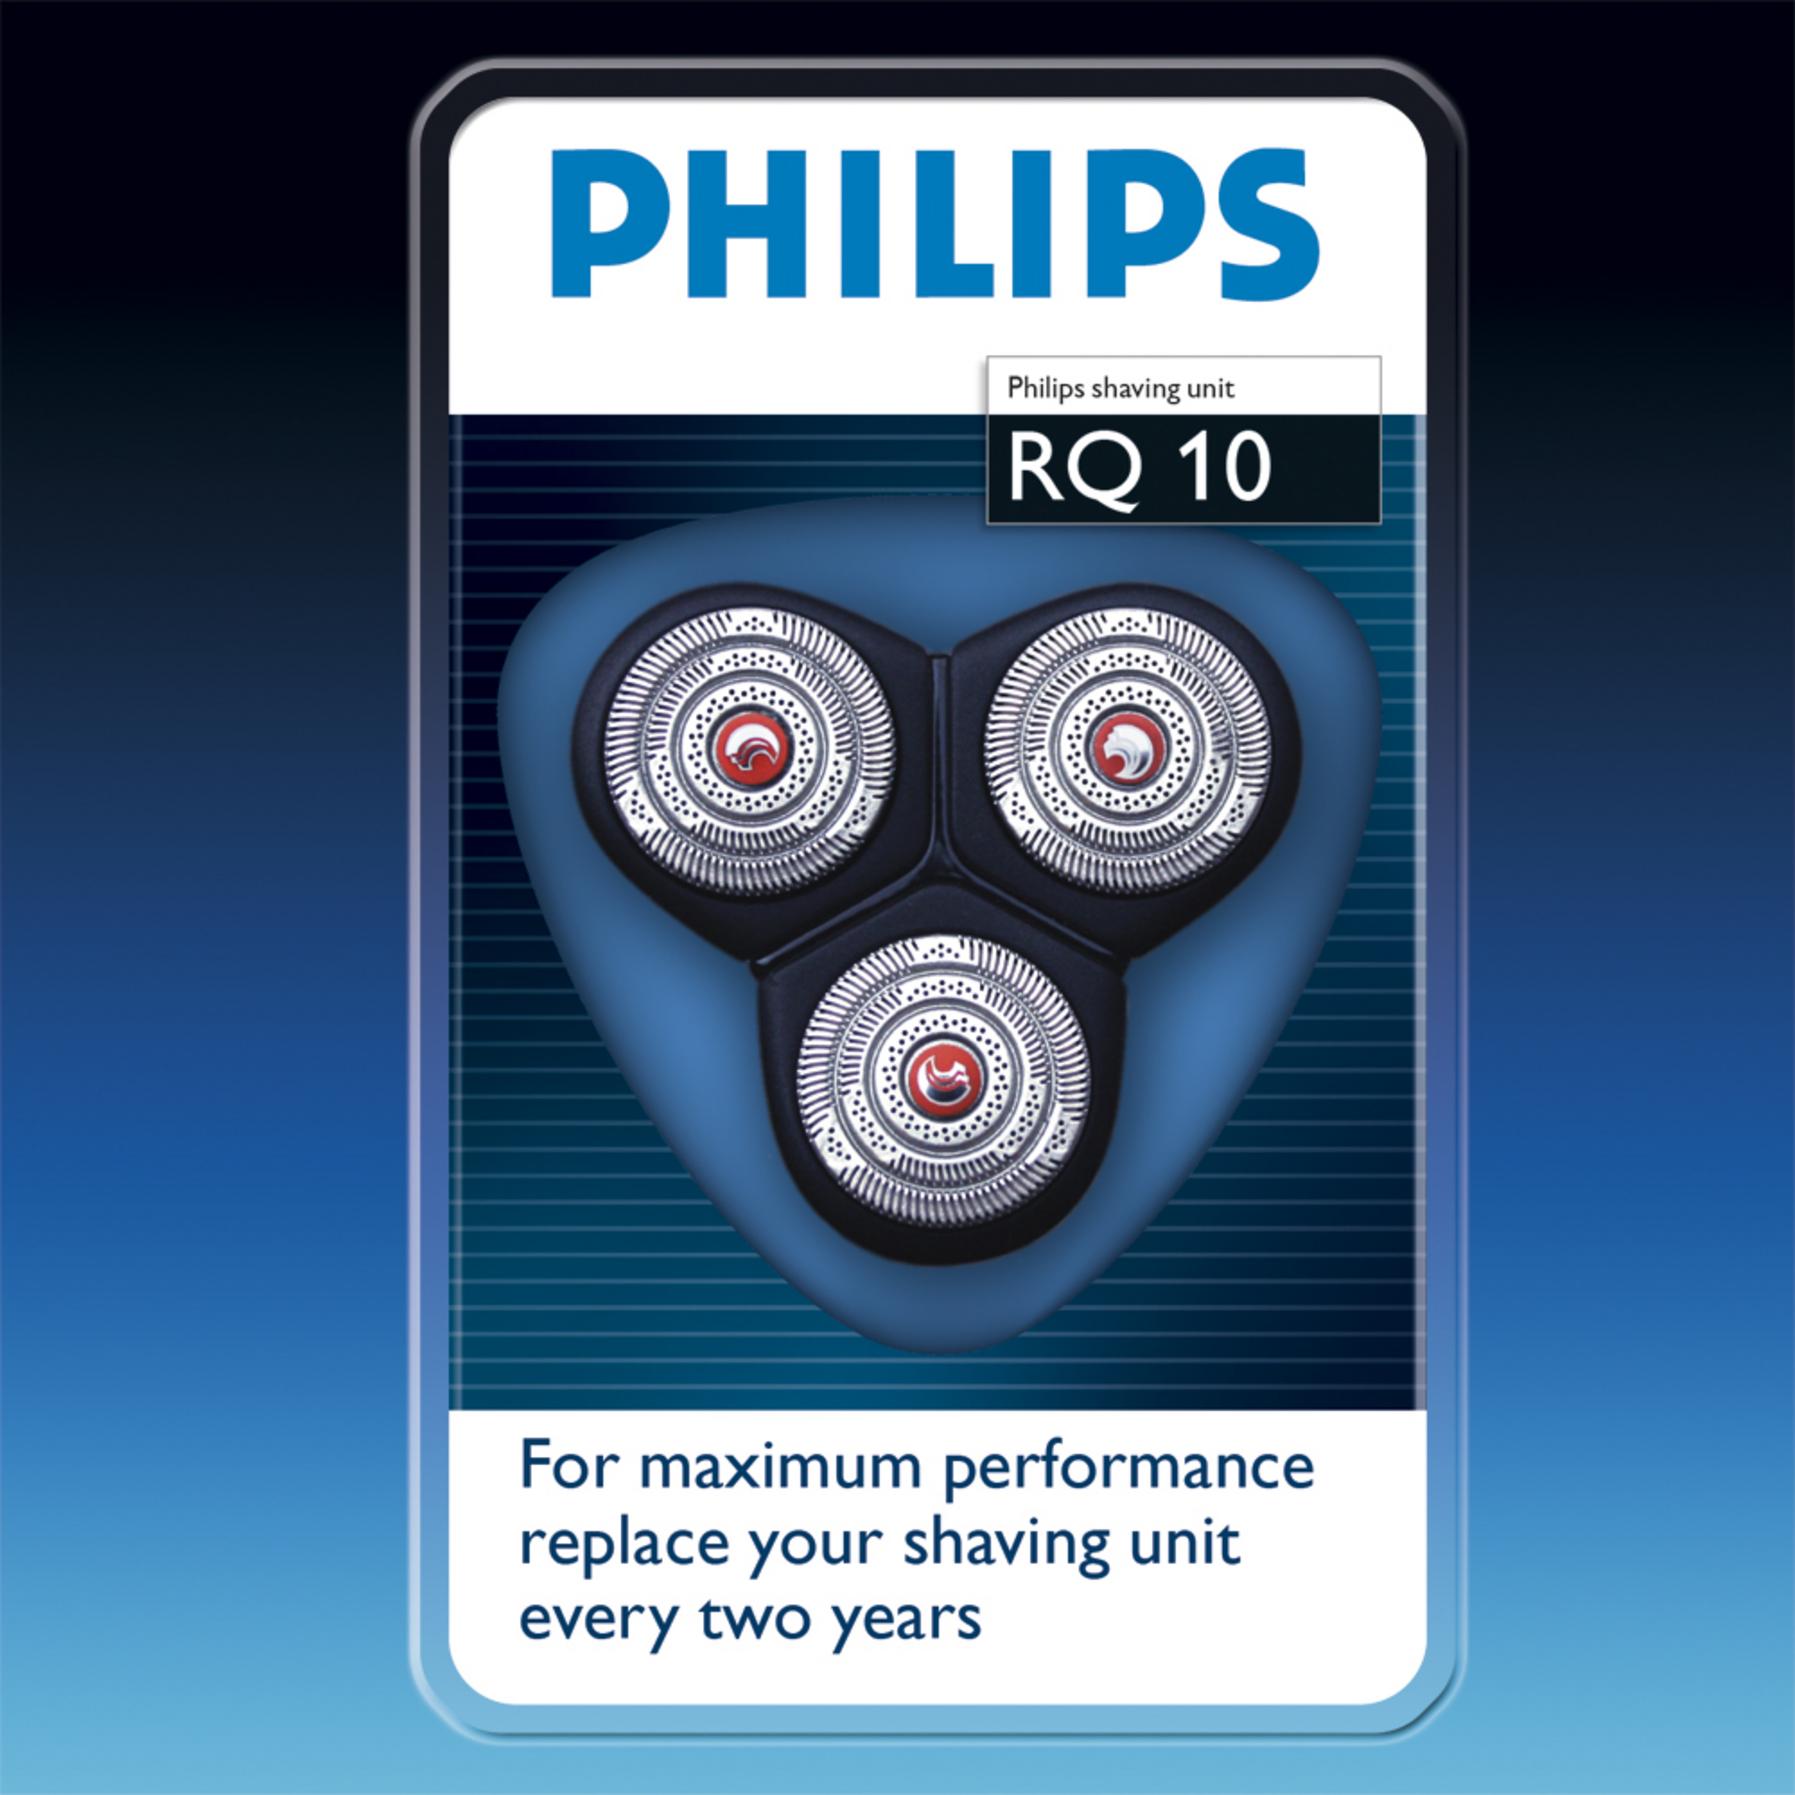 Philips shaving unit RQ10